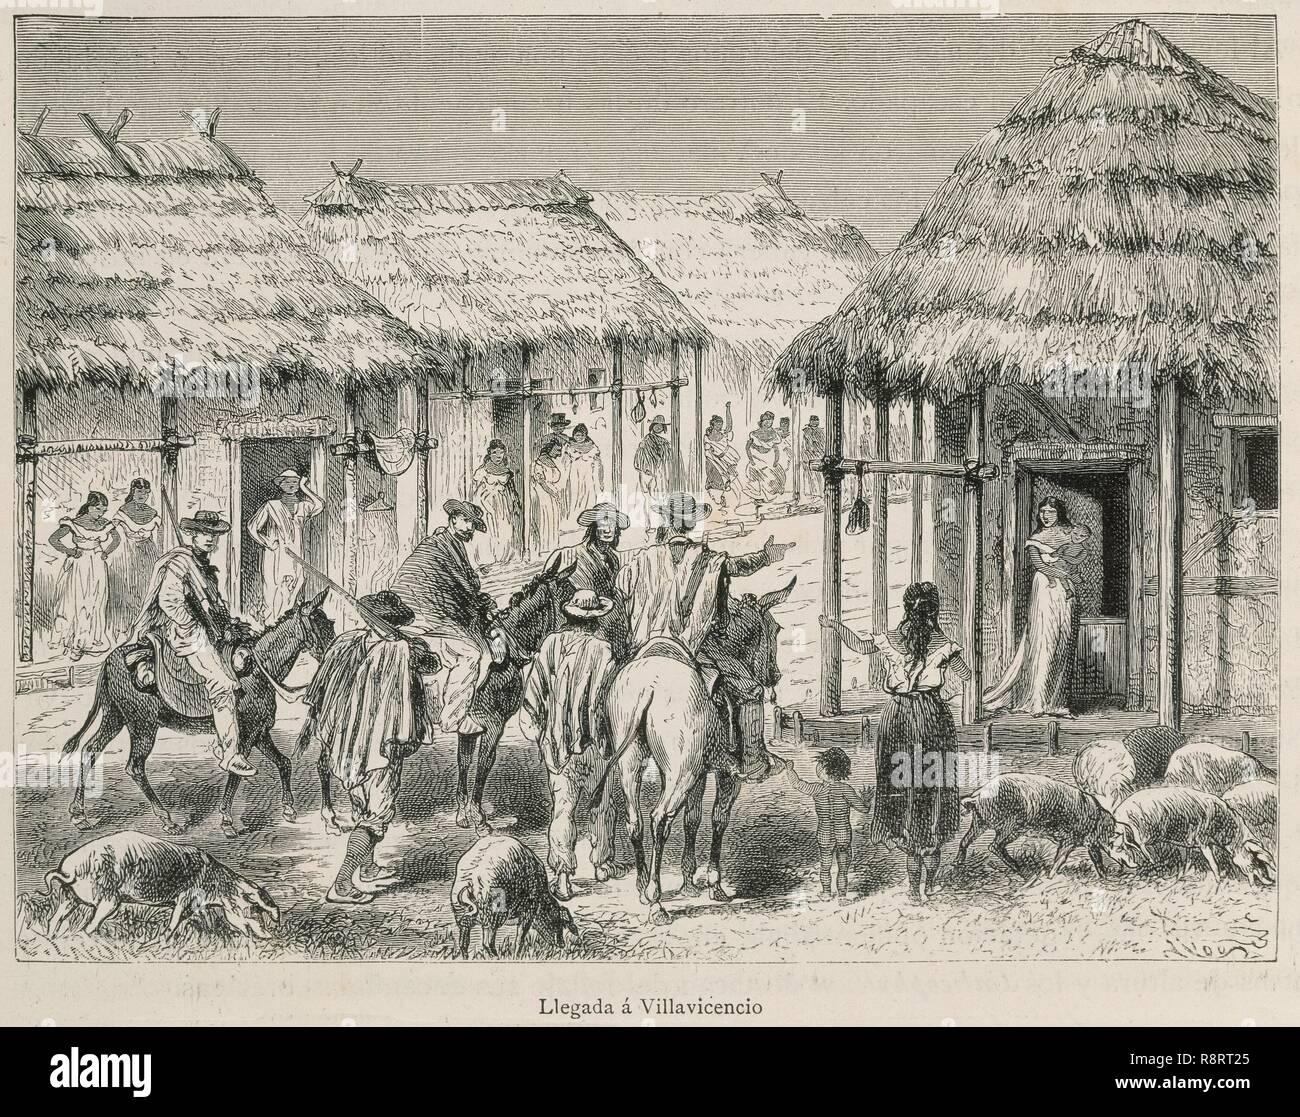 LLEGADA A VILLAVICENCIO - CAMINOS REALES DE COLOMBIA - GRABADO TOMADO DE AMERICA PINTORESCA - TOMO 3 - 1884. Author: Riou. Location: PRIVATE COLLECTION. Stock Photo